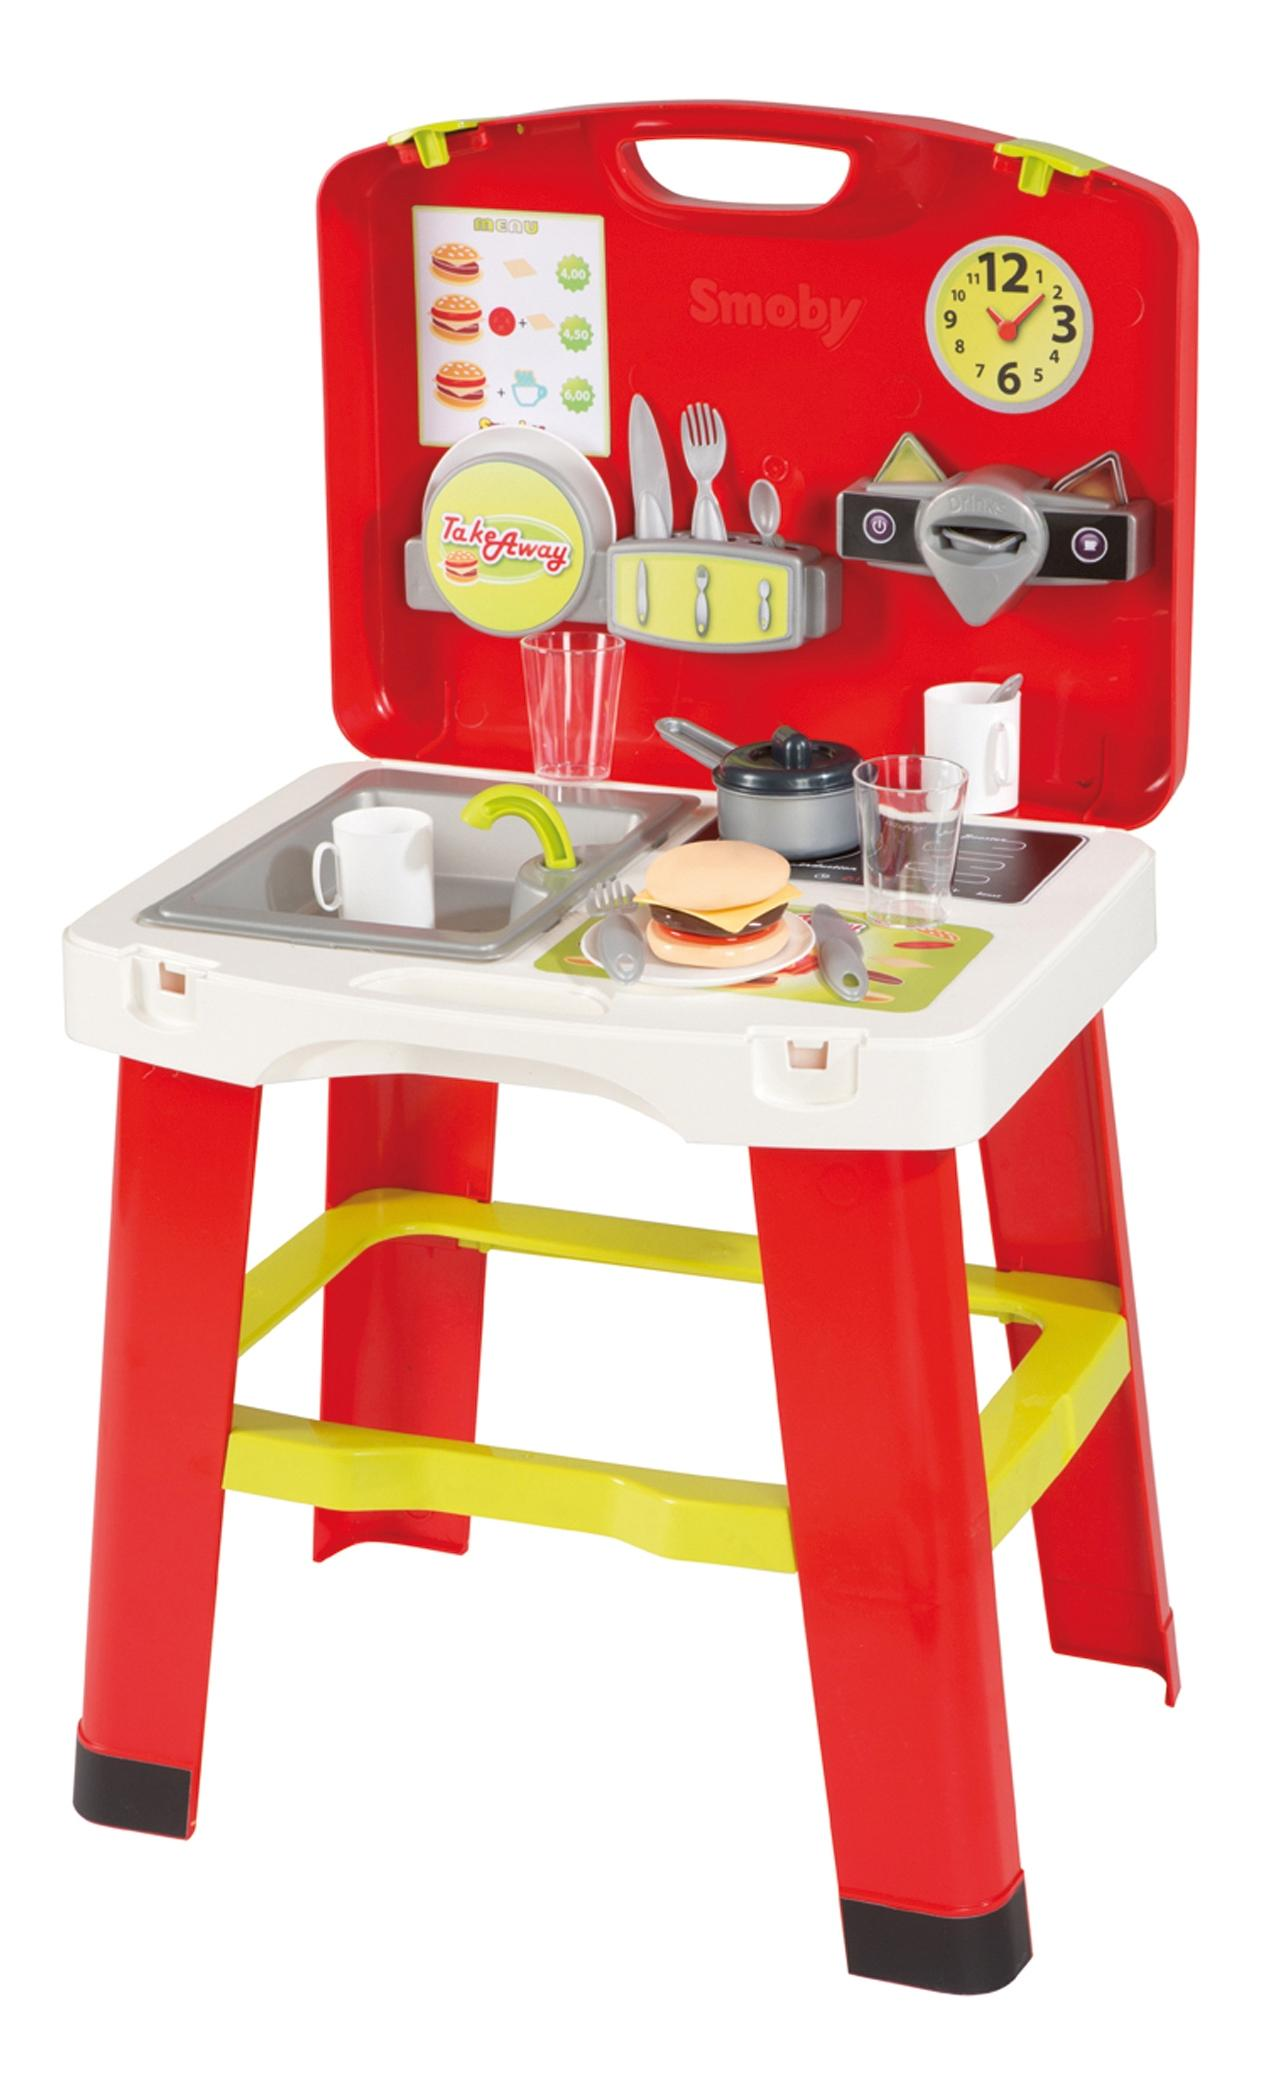 Кухня в чемоданчике, 43x35x76,5 см, 1/4 Smoby 24171